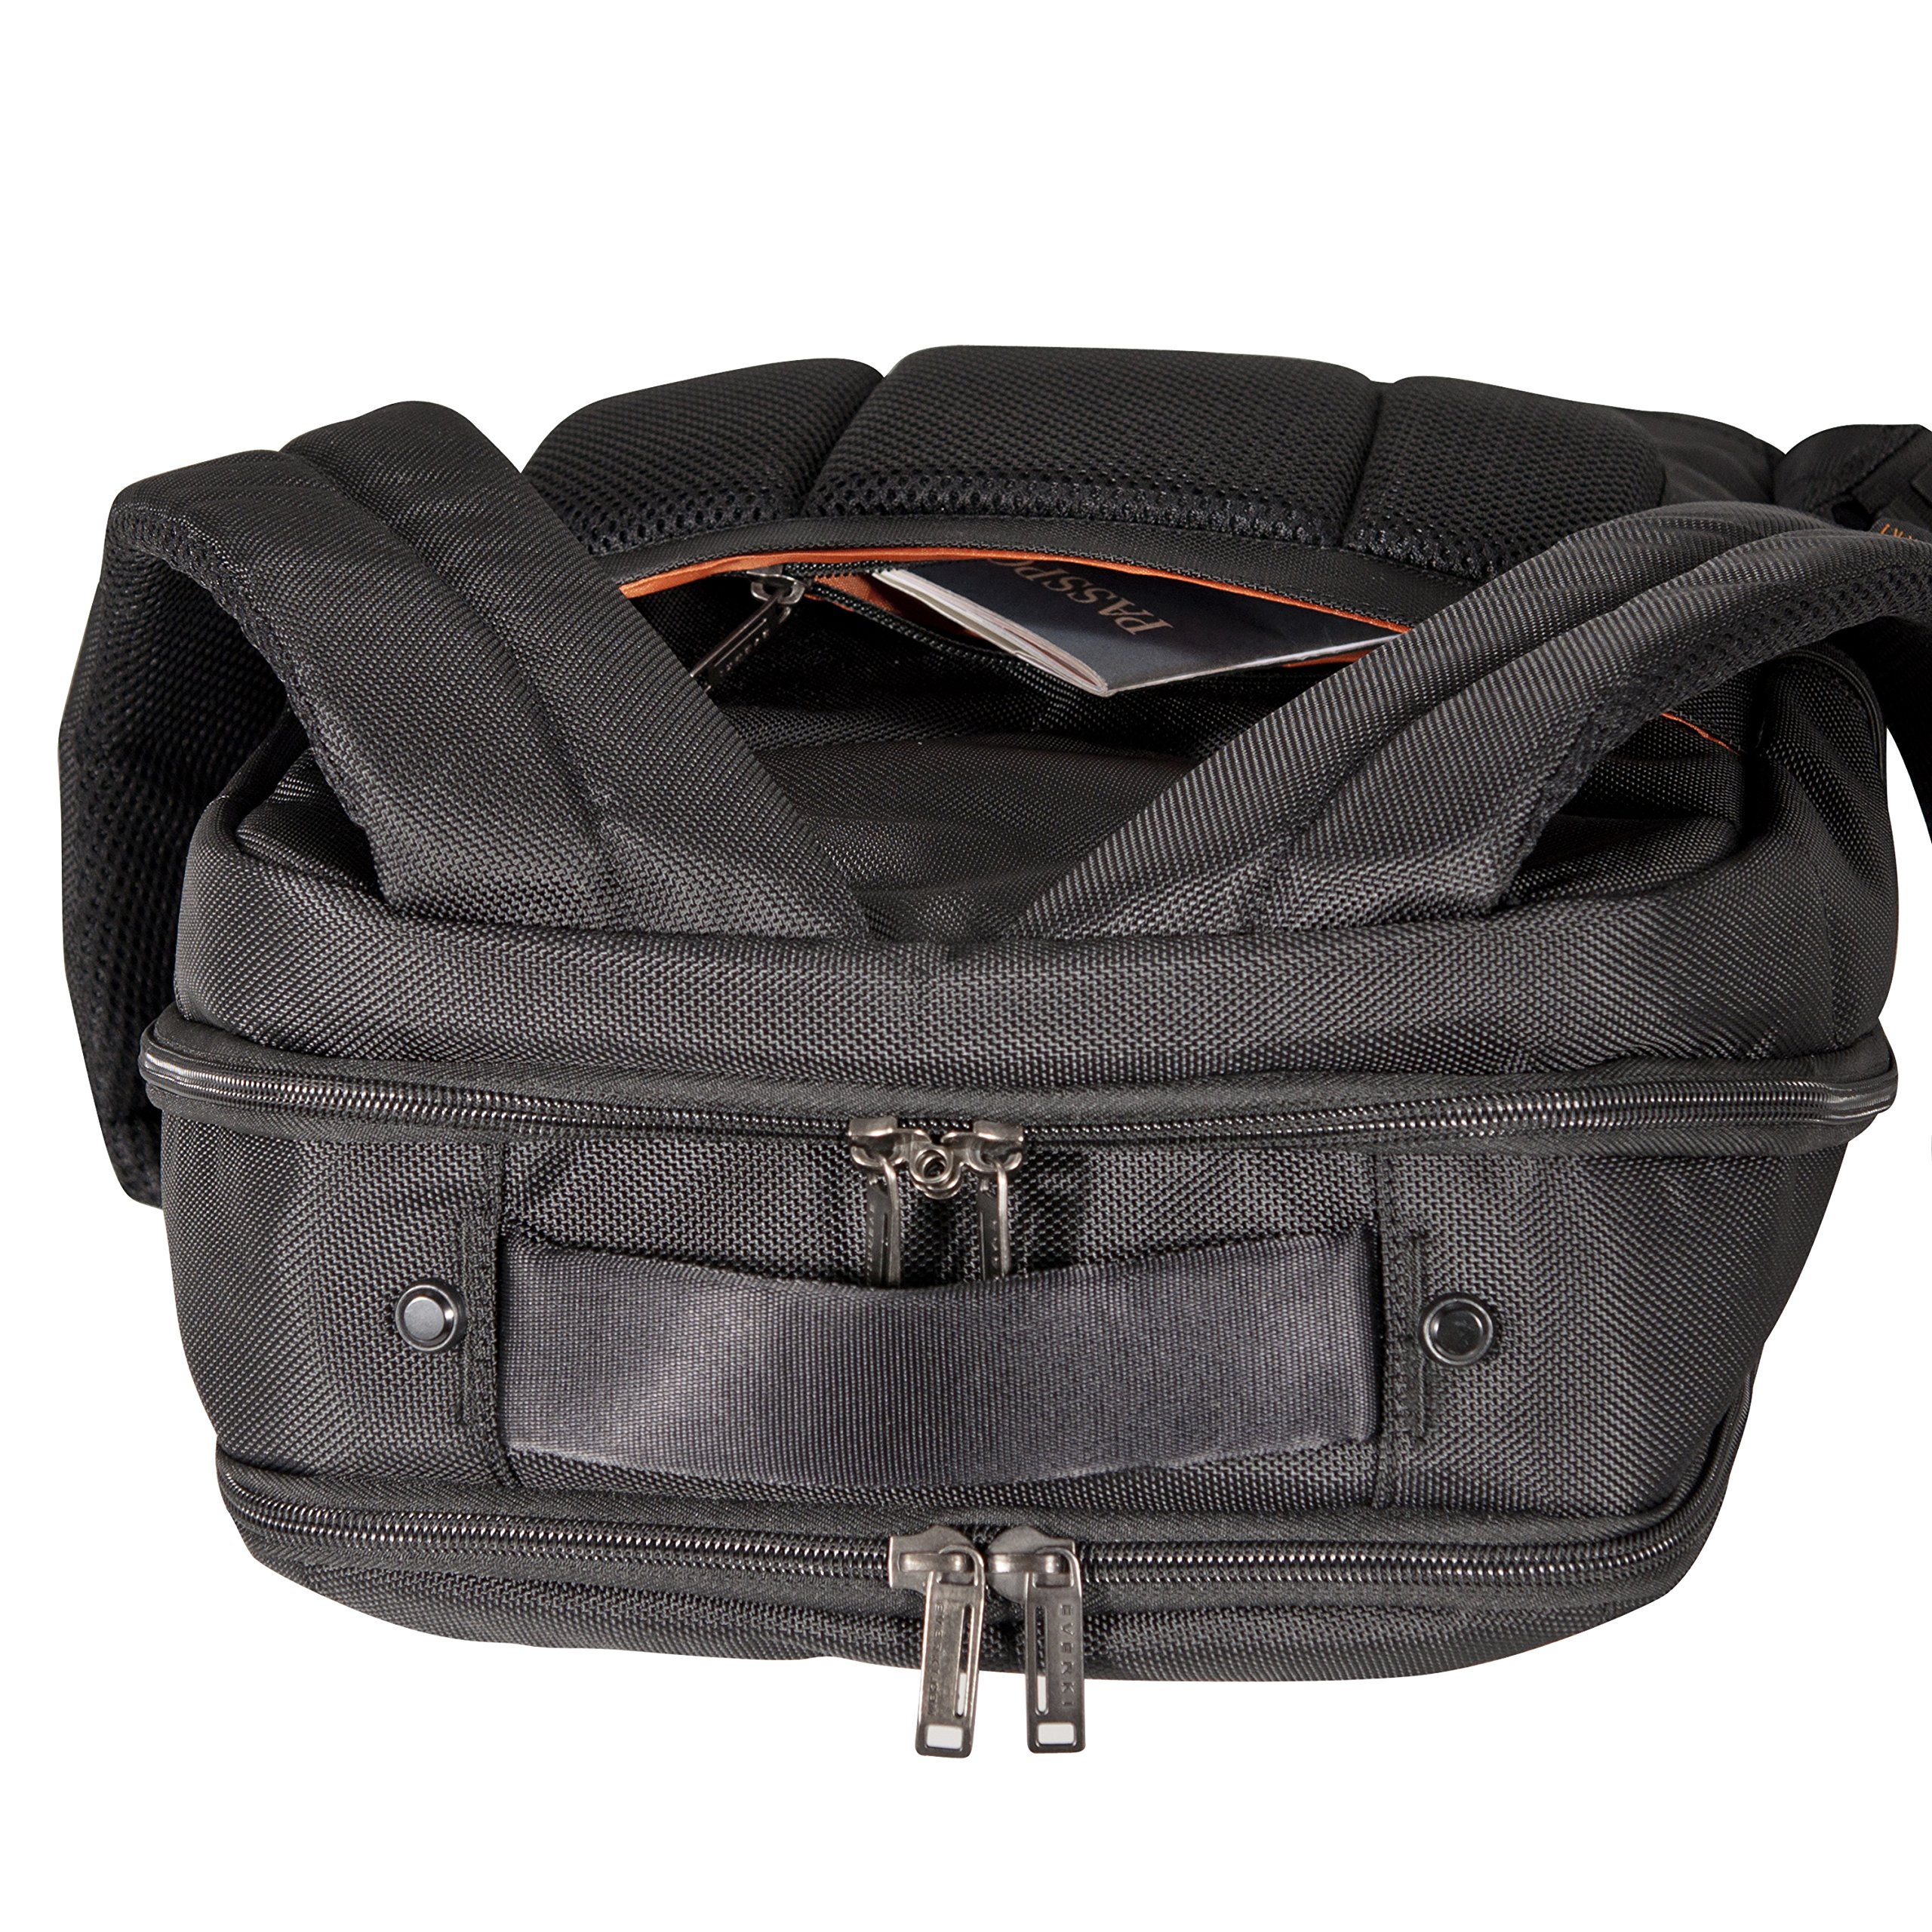 Everki Studio Slim Laptop Backpack for upto 14.1-Inch Laptops/15-Inch MacBook Pro (EKP118) by Everki (Image #7)